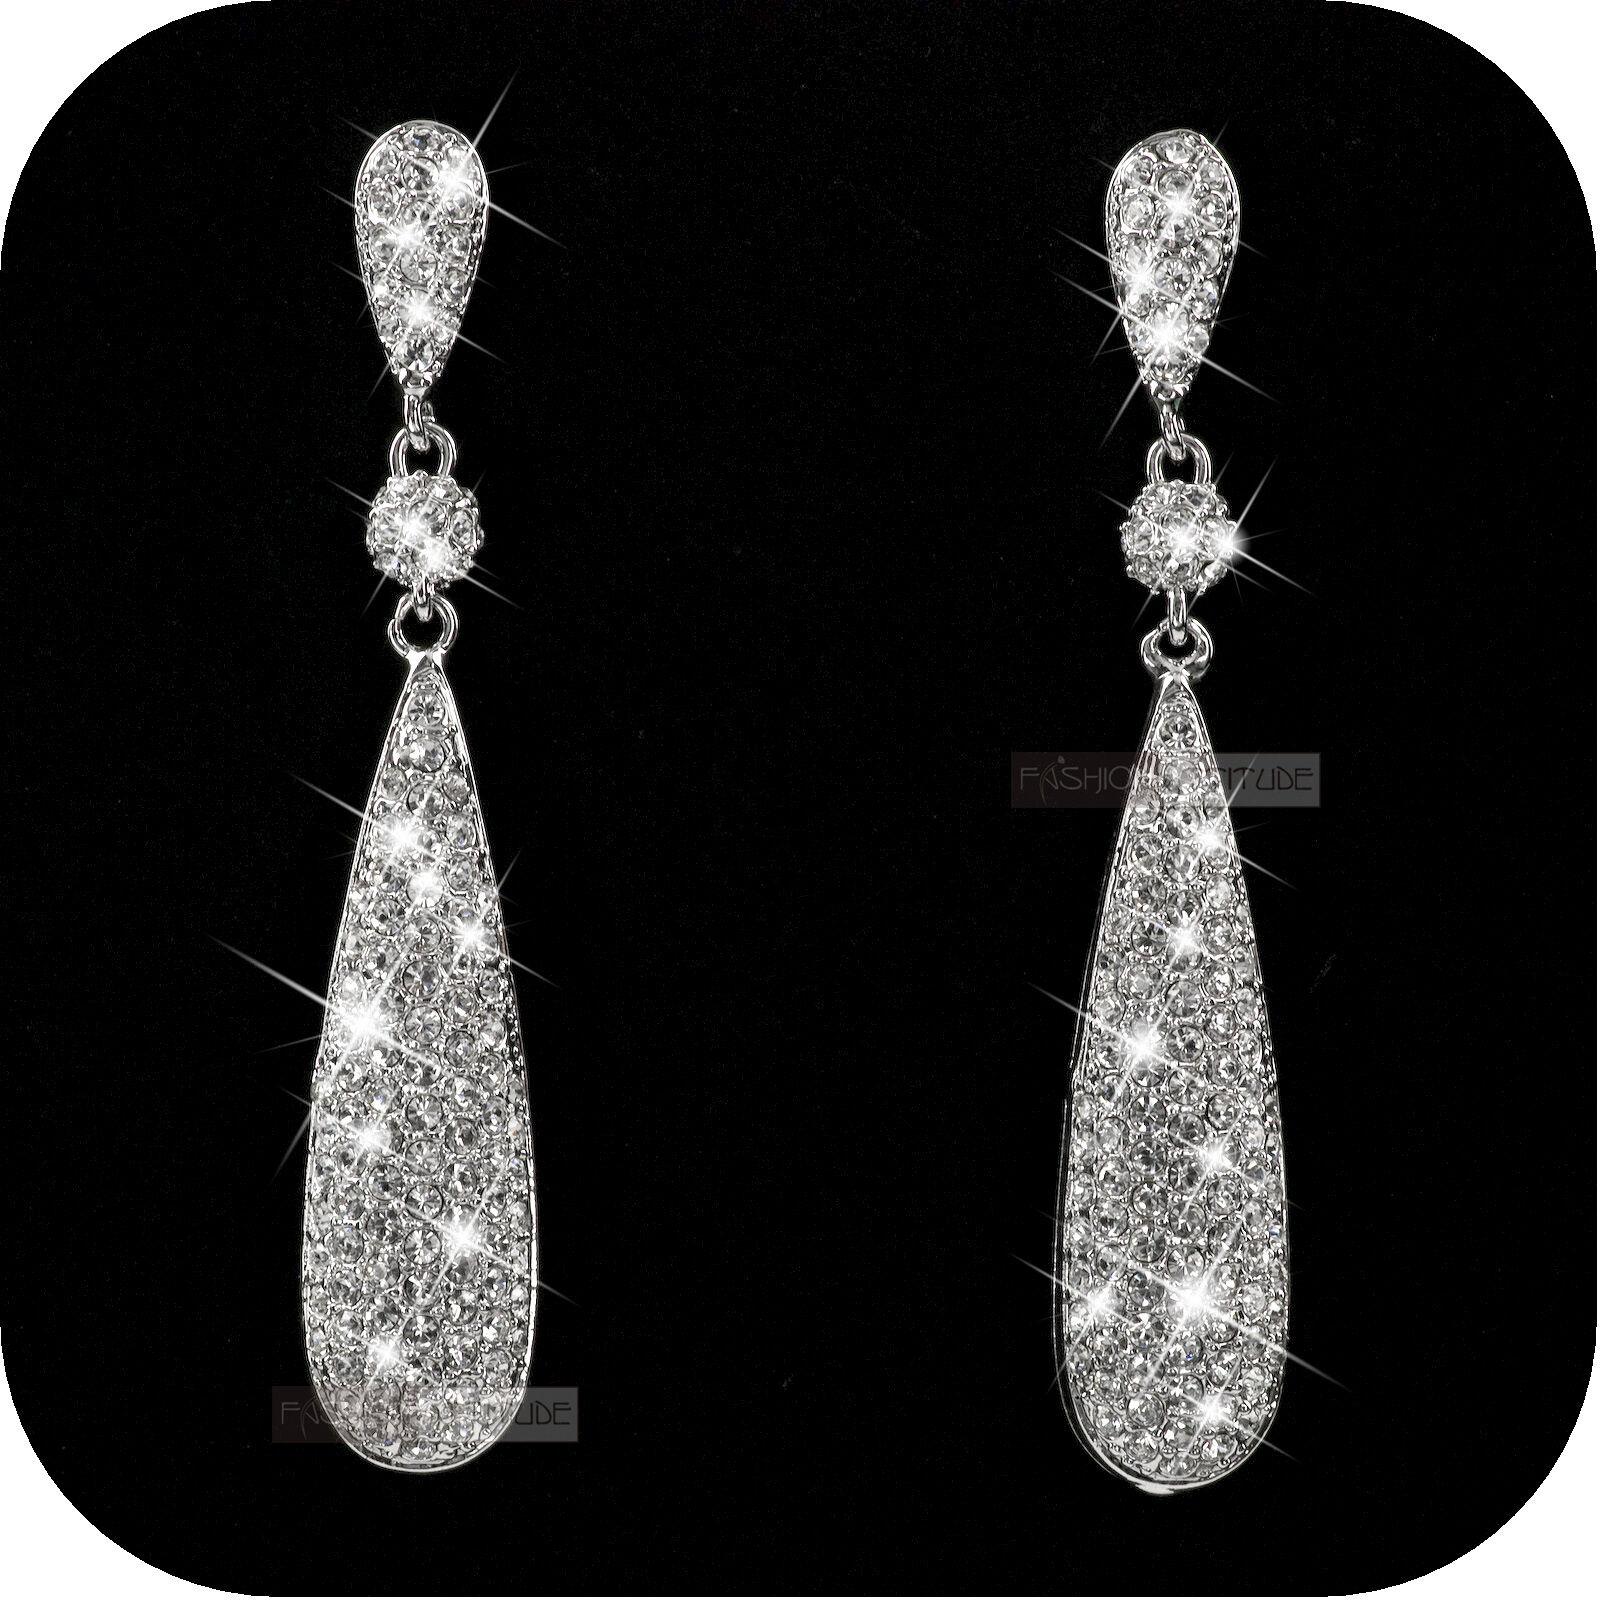 18k White Gold Gp Made With Swarovski Crystal Stud Earrings Dangle Long